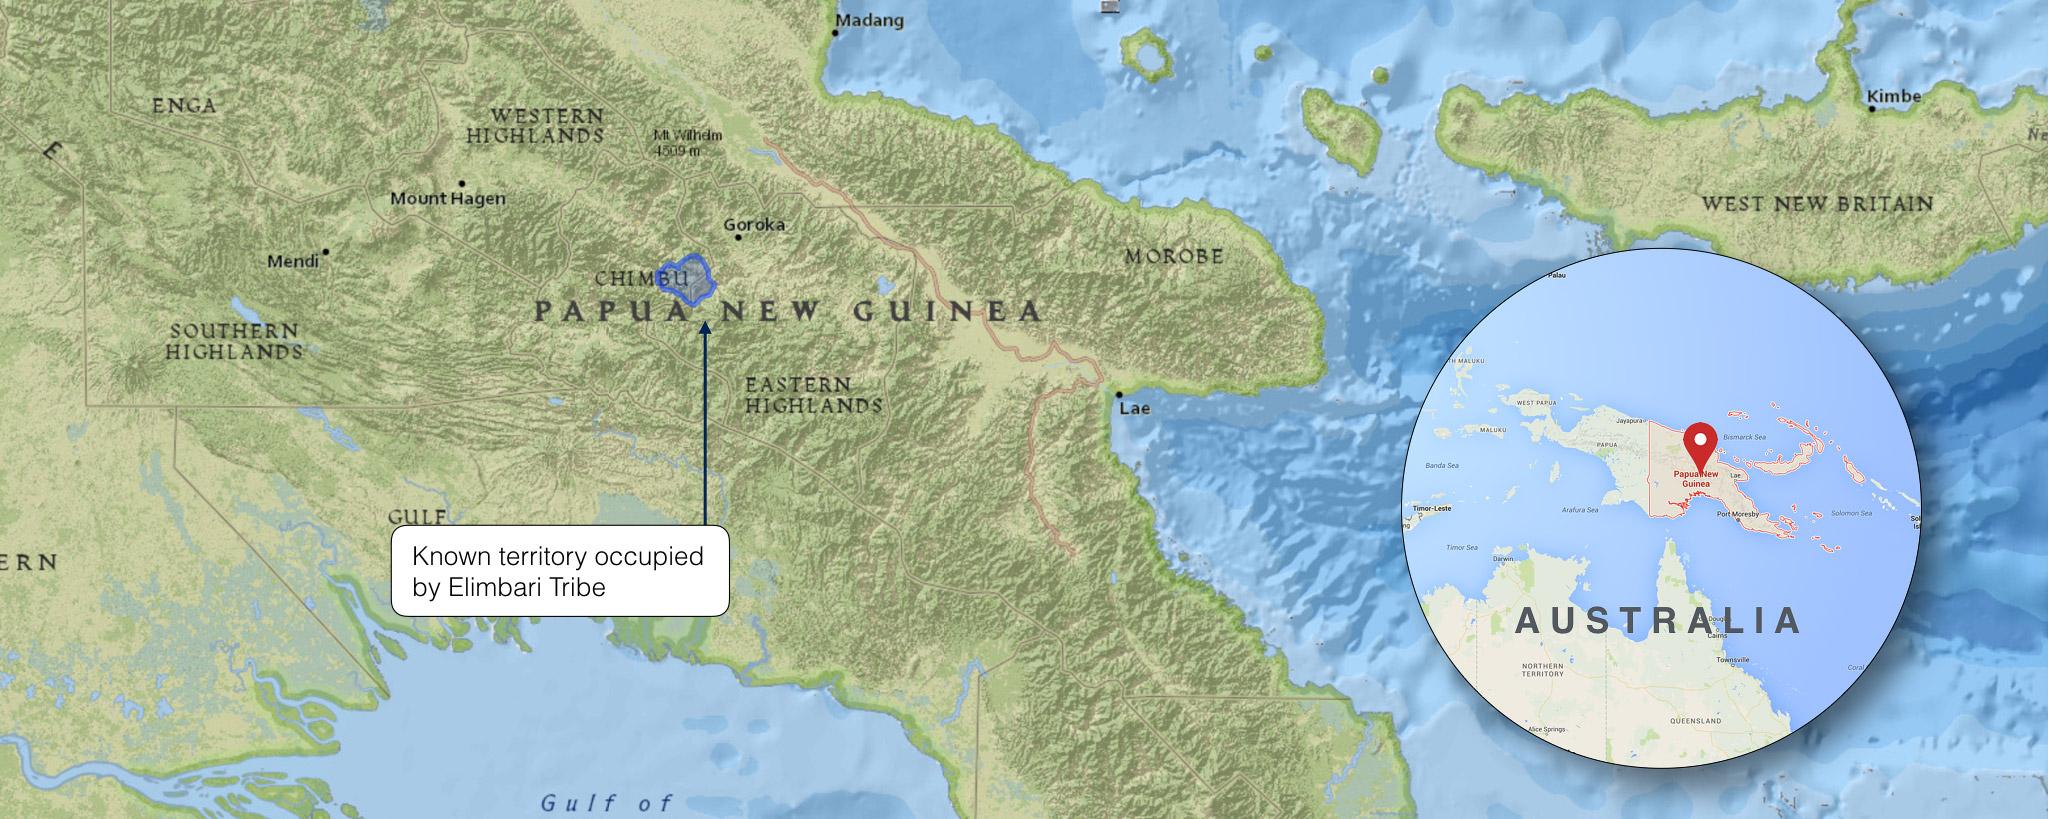 ELIMBARI TRIBE CONTROLLED TERRITORY IN PAPUA NEW GUINEA